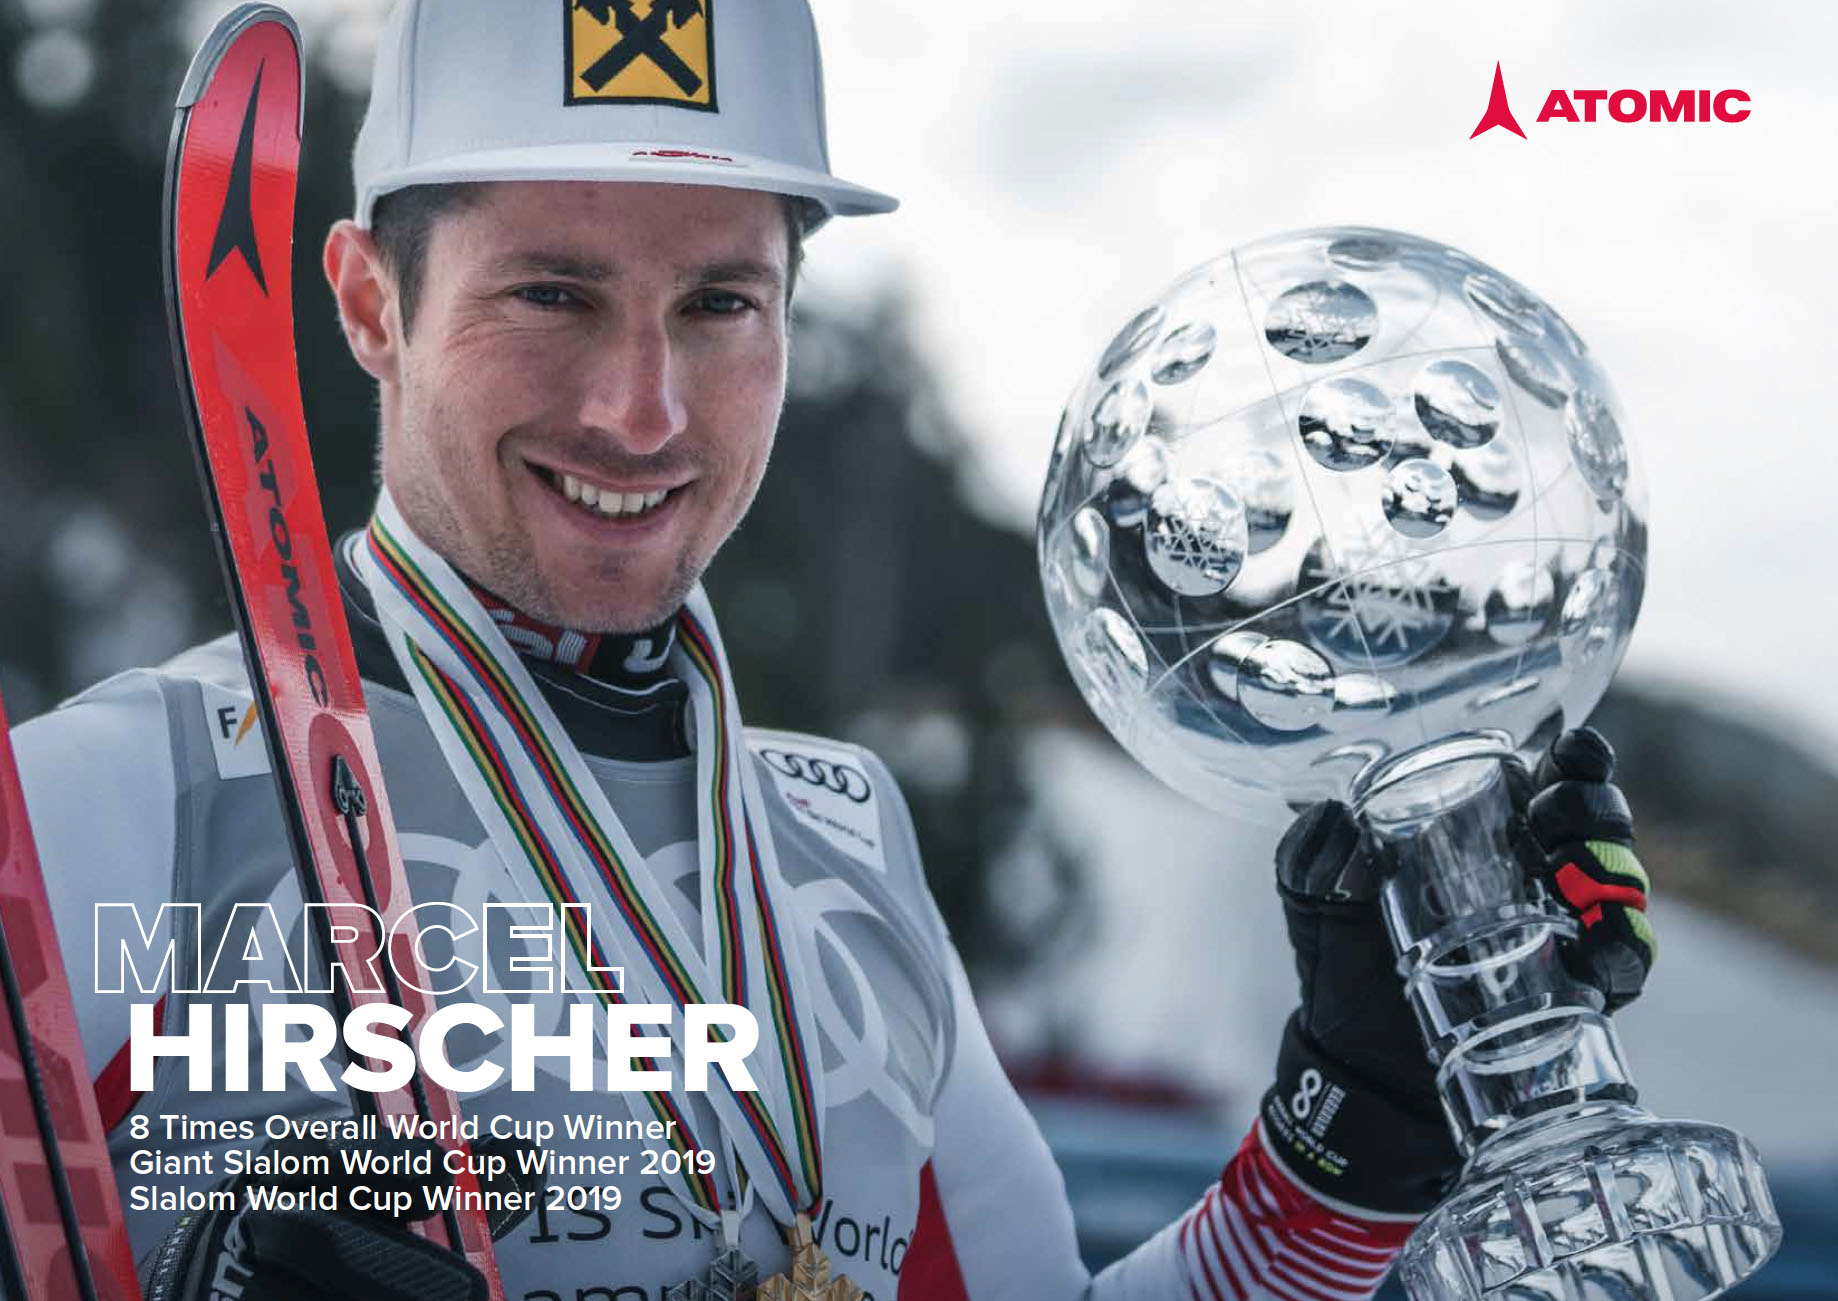 Marcel-Hirscher